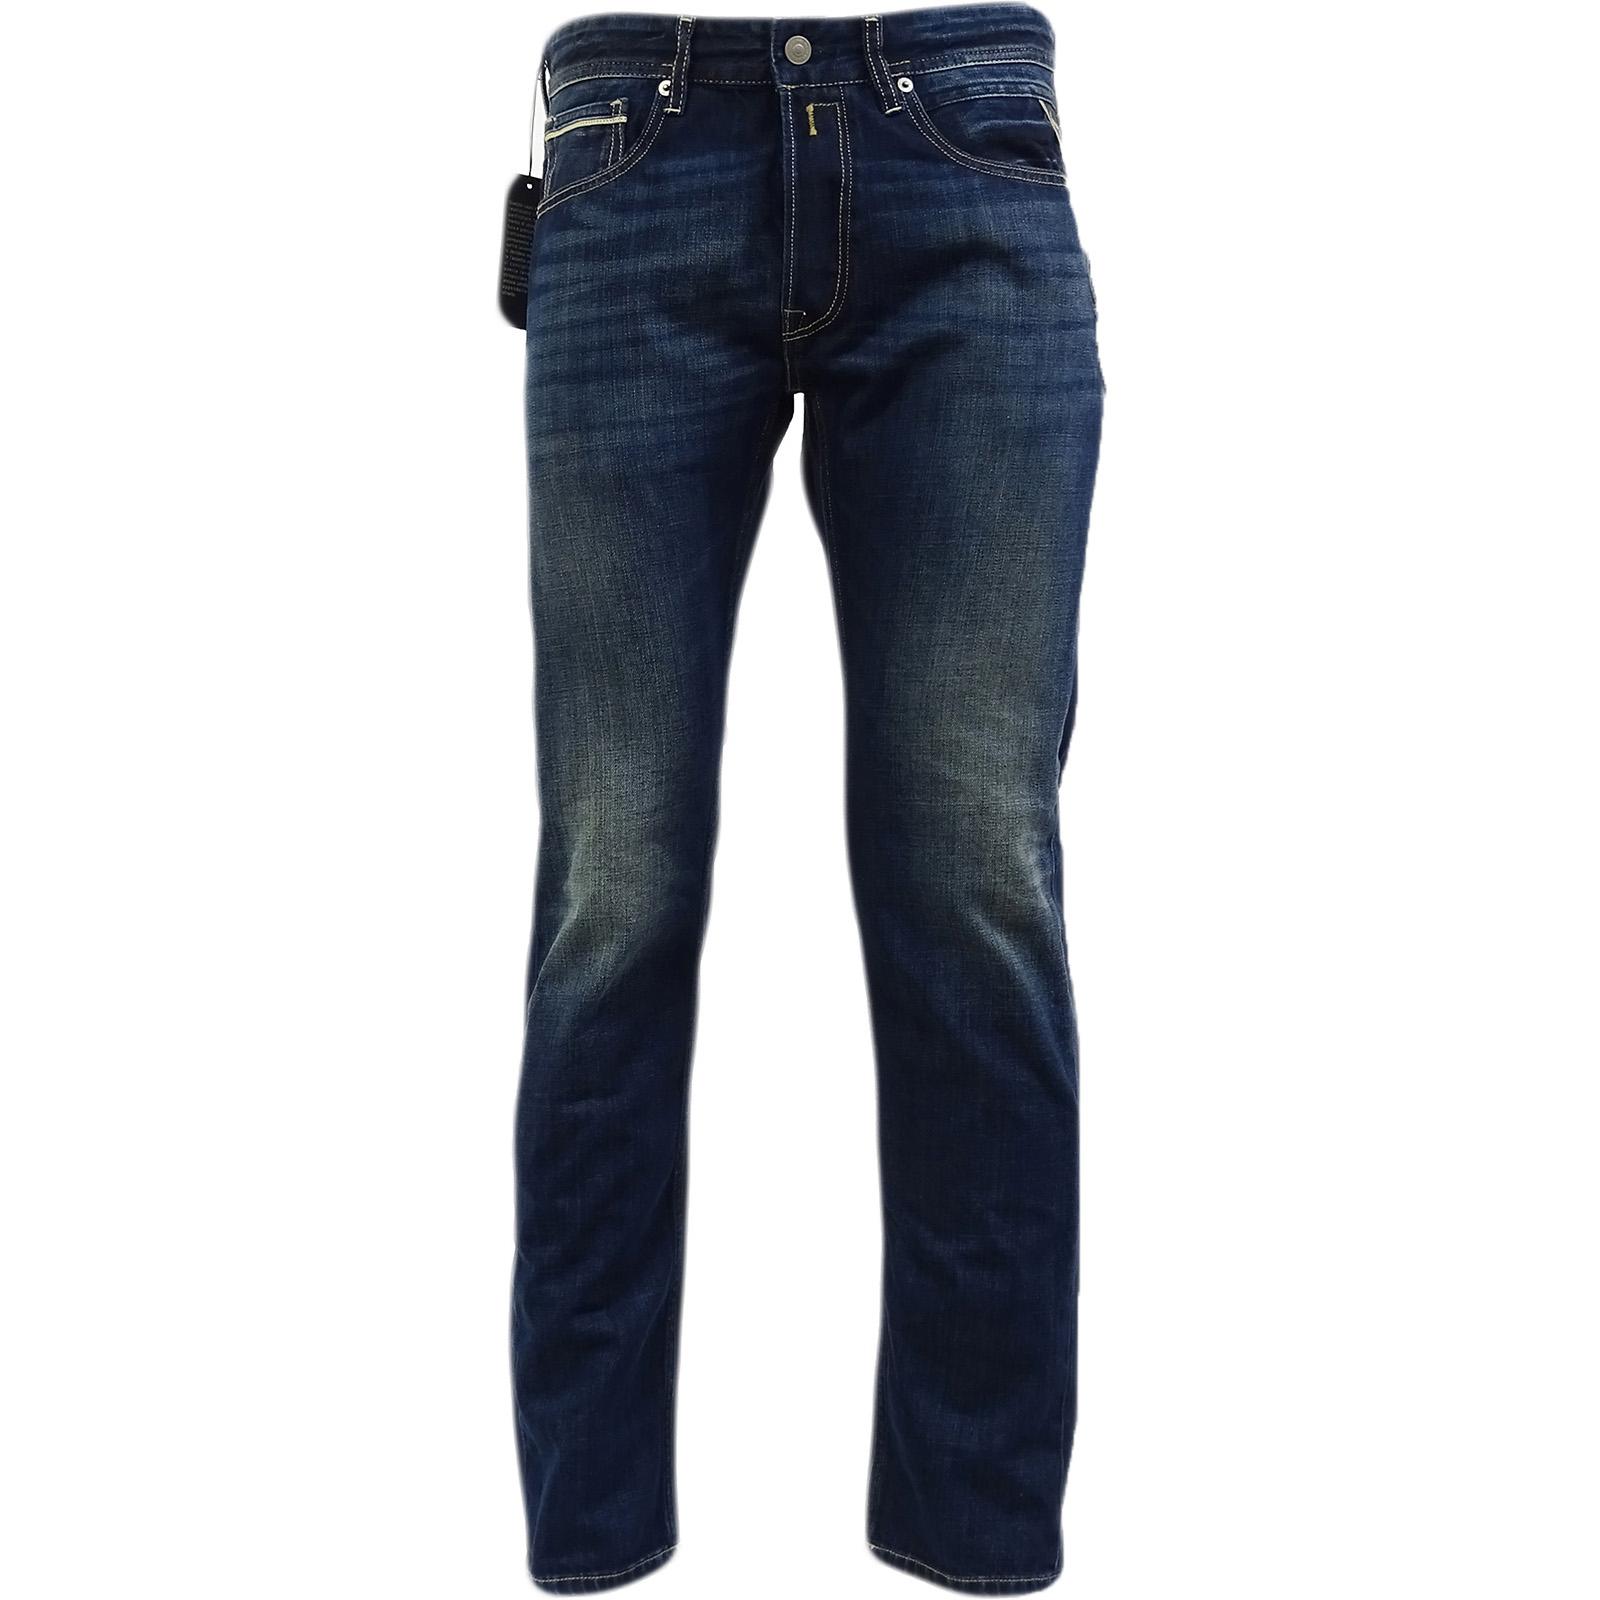 Ma972 Grover Replay Fit Jean Regular Blue Dark rUUYE